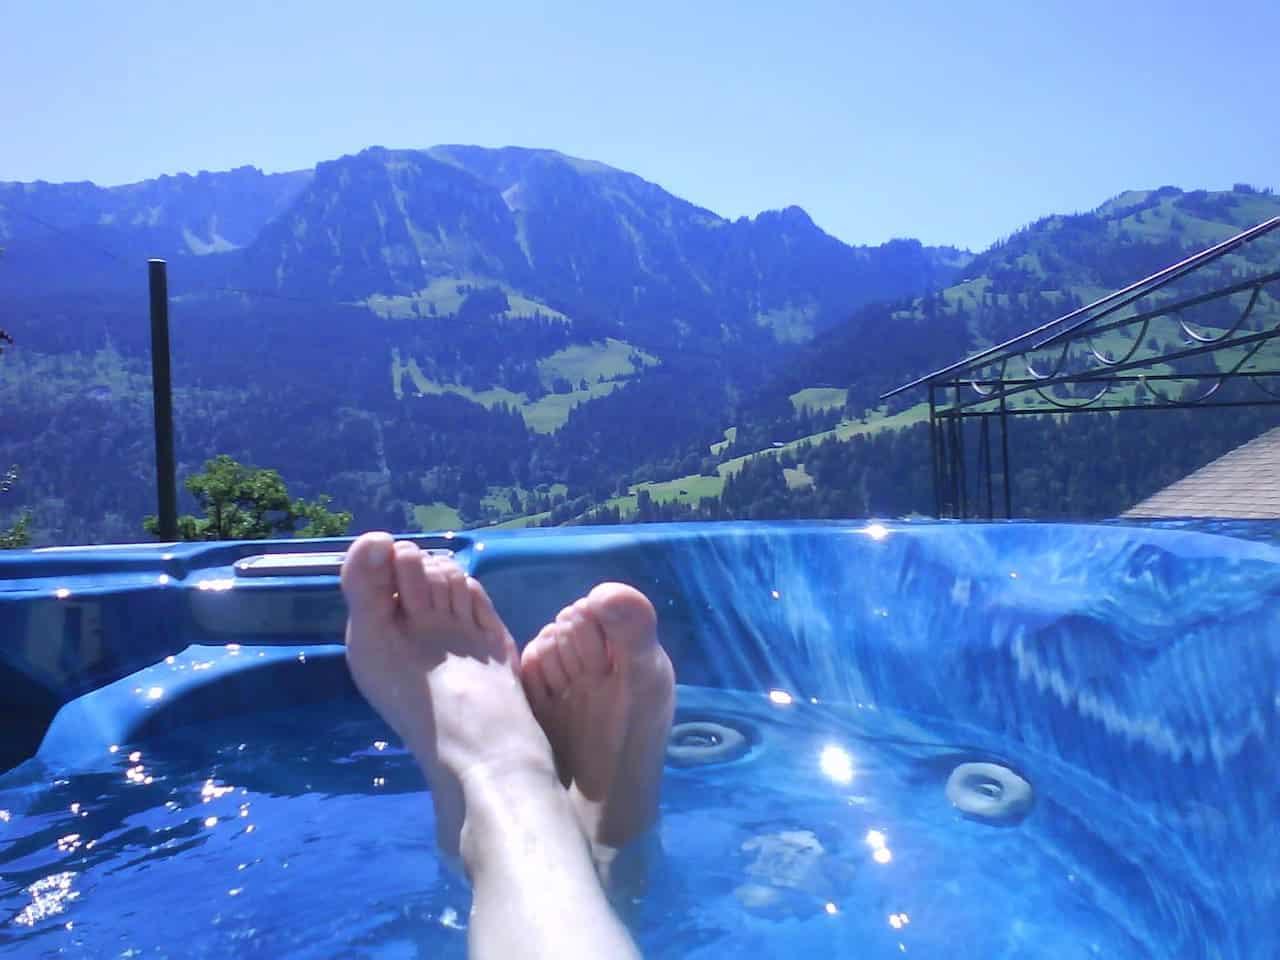 Image of Airbnb rental in Bern, Switzerland